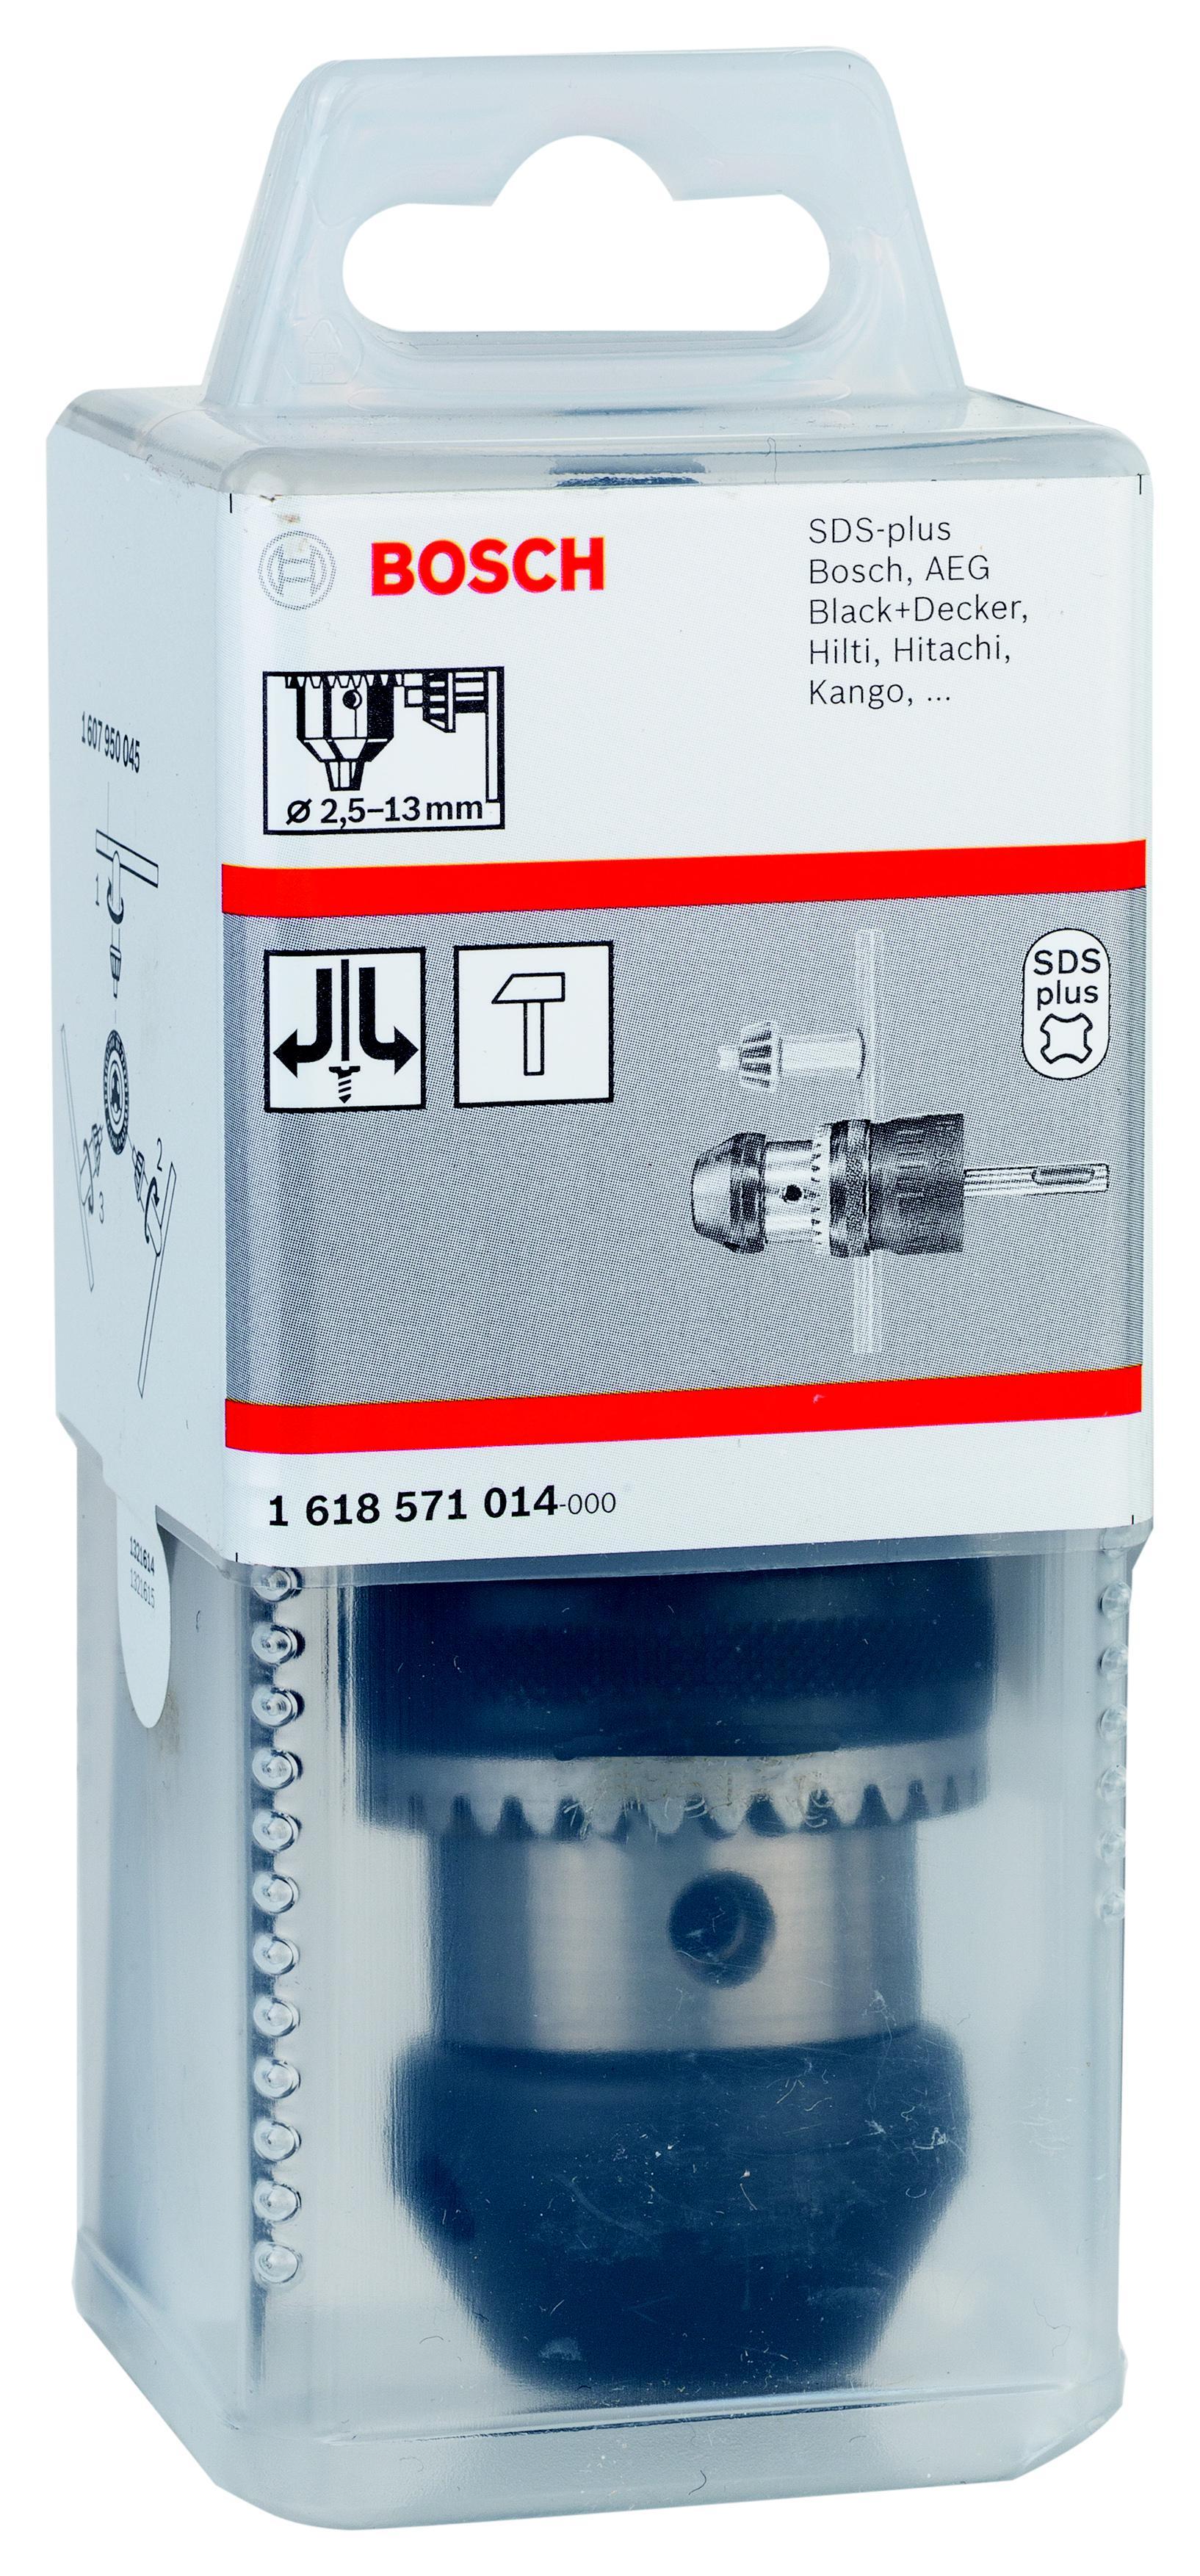 Патрон для дрели Bosch Ф13мм 1/2 (1618571014) цена